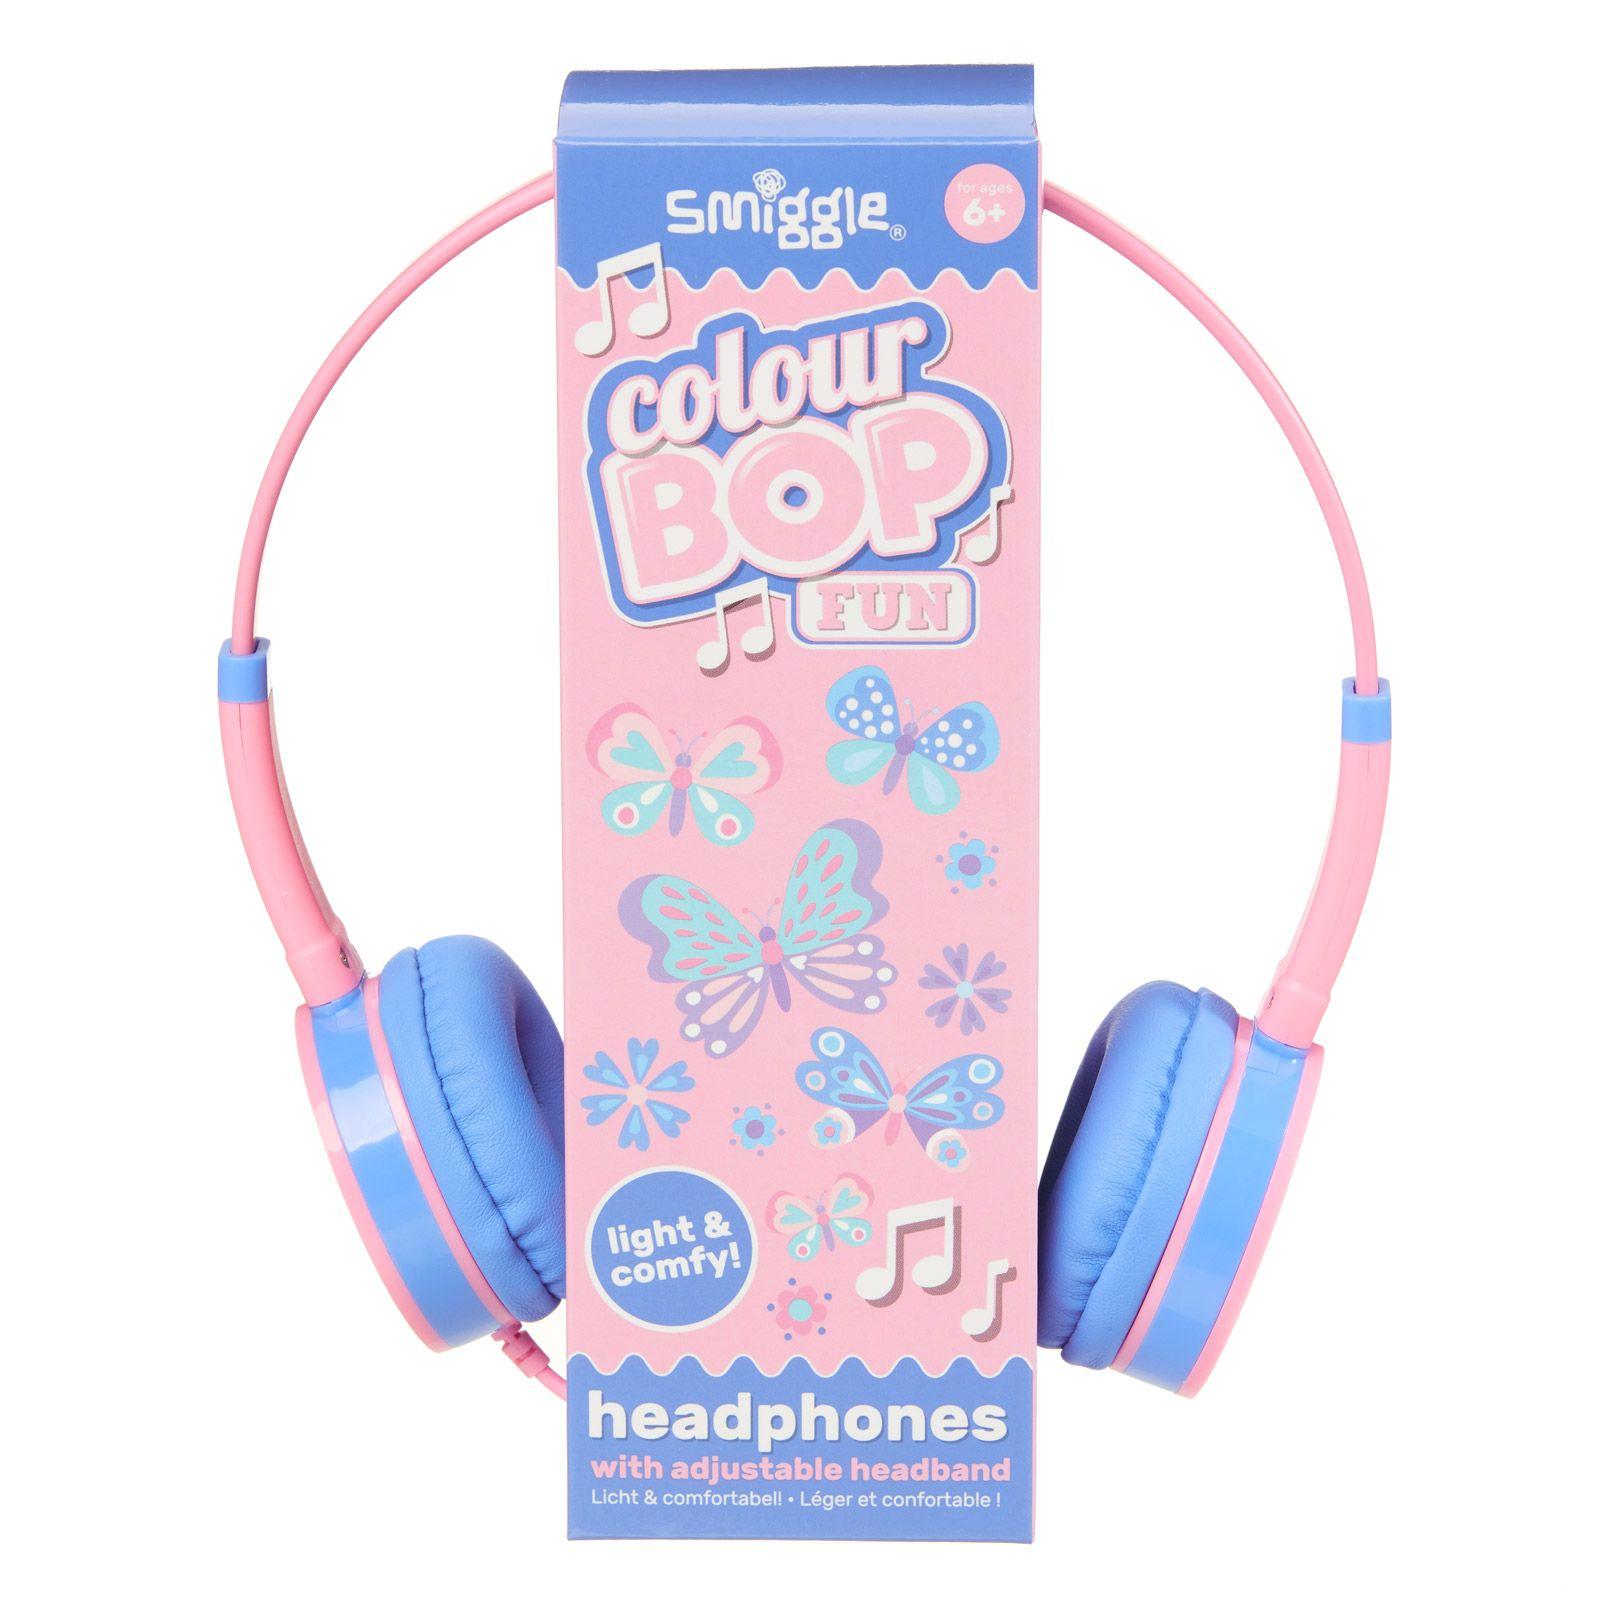 another chance unique design footwear Fun Colour Bop Headphones Pink - Smiggle Online | Matara